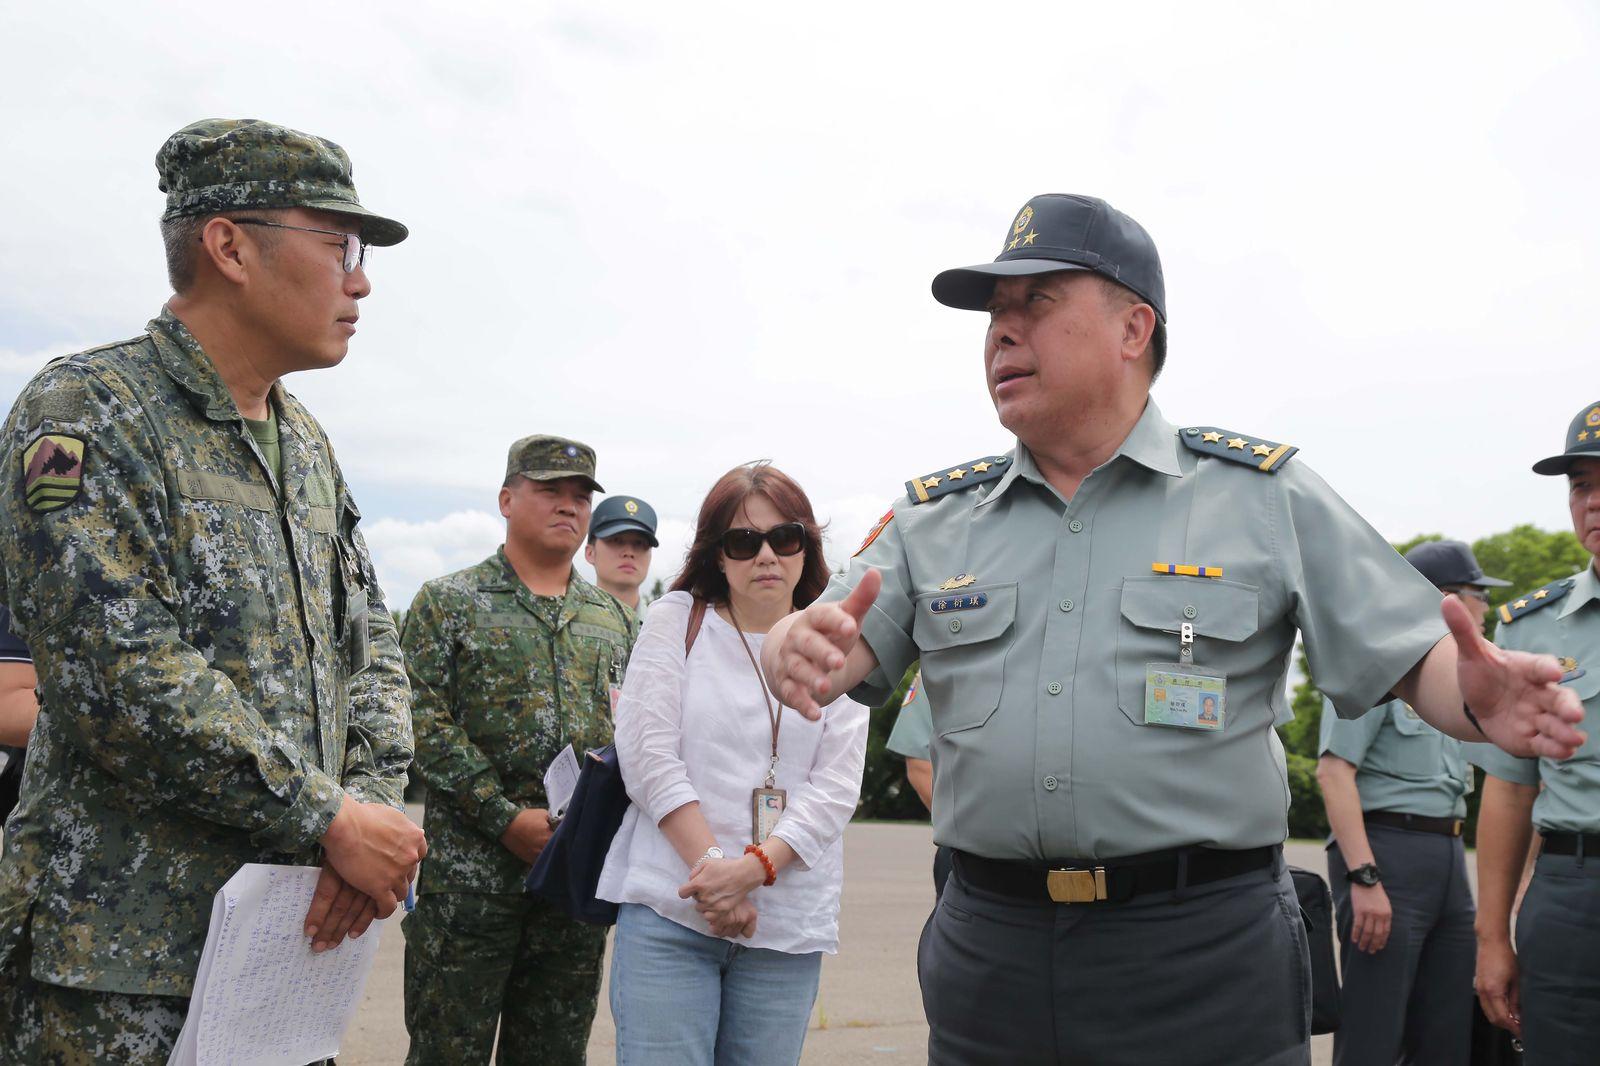 GEN Hsu, VCGS/Executive, inspected Cheng kung ling Barracks' exercise preparation